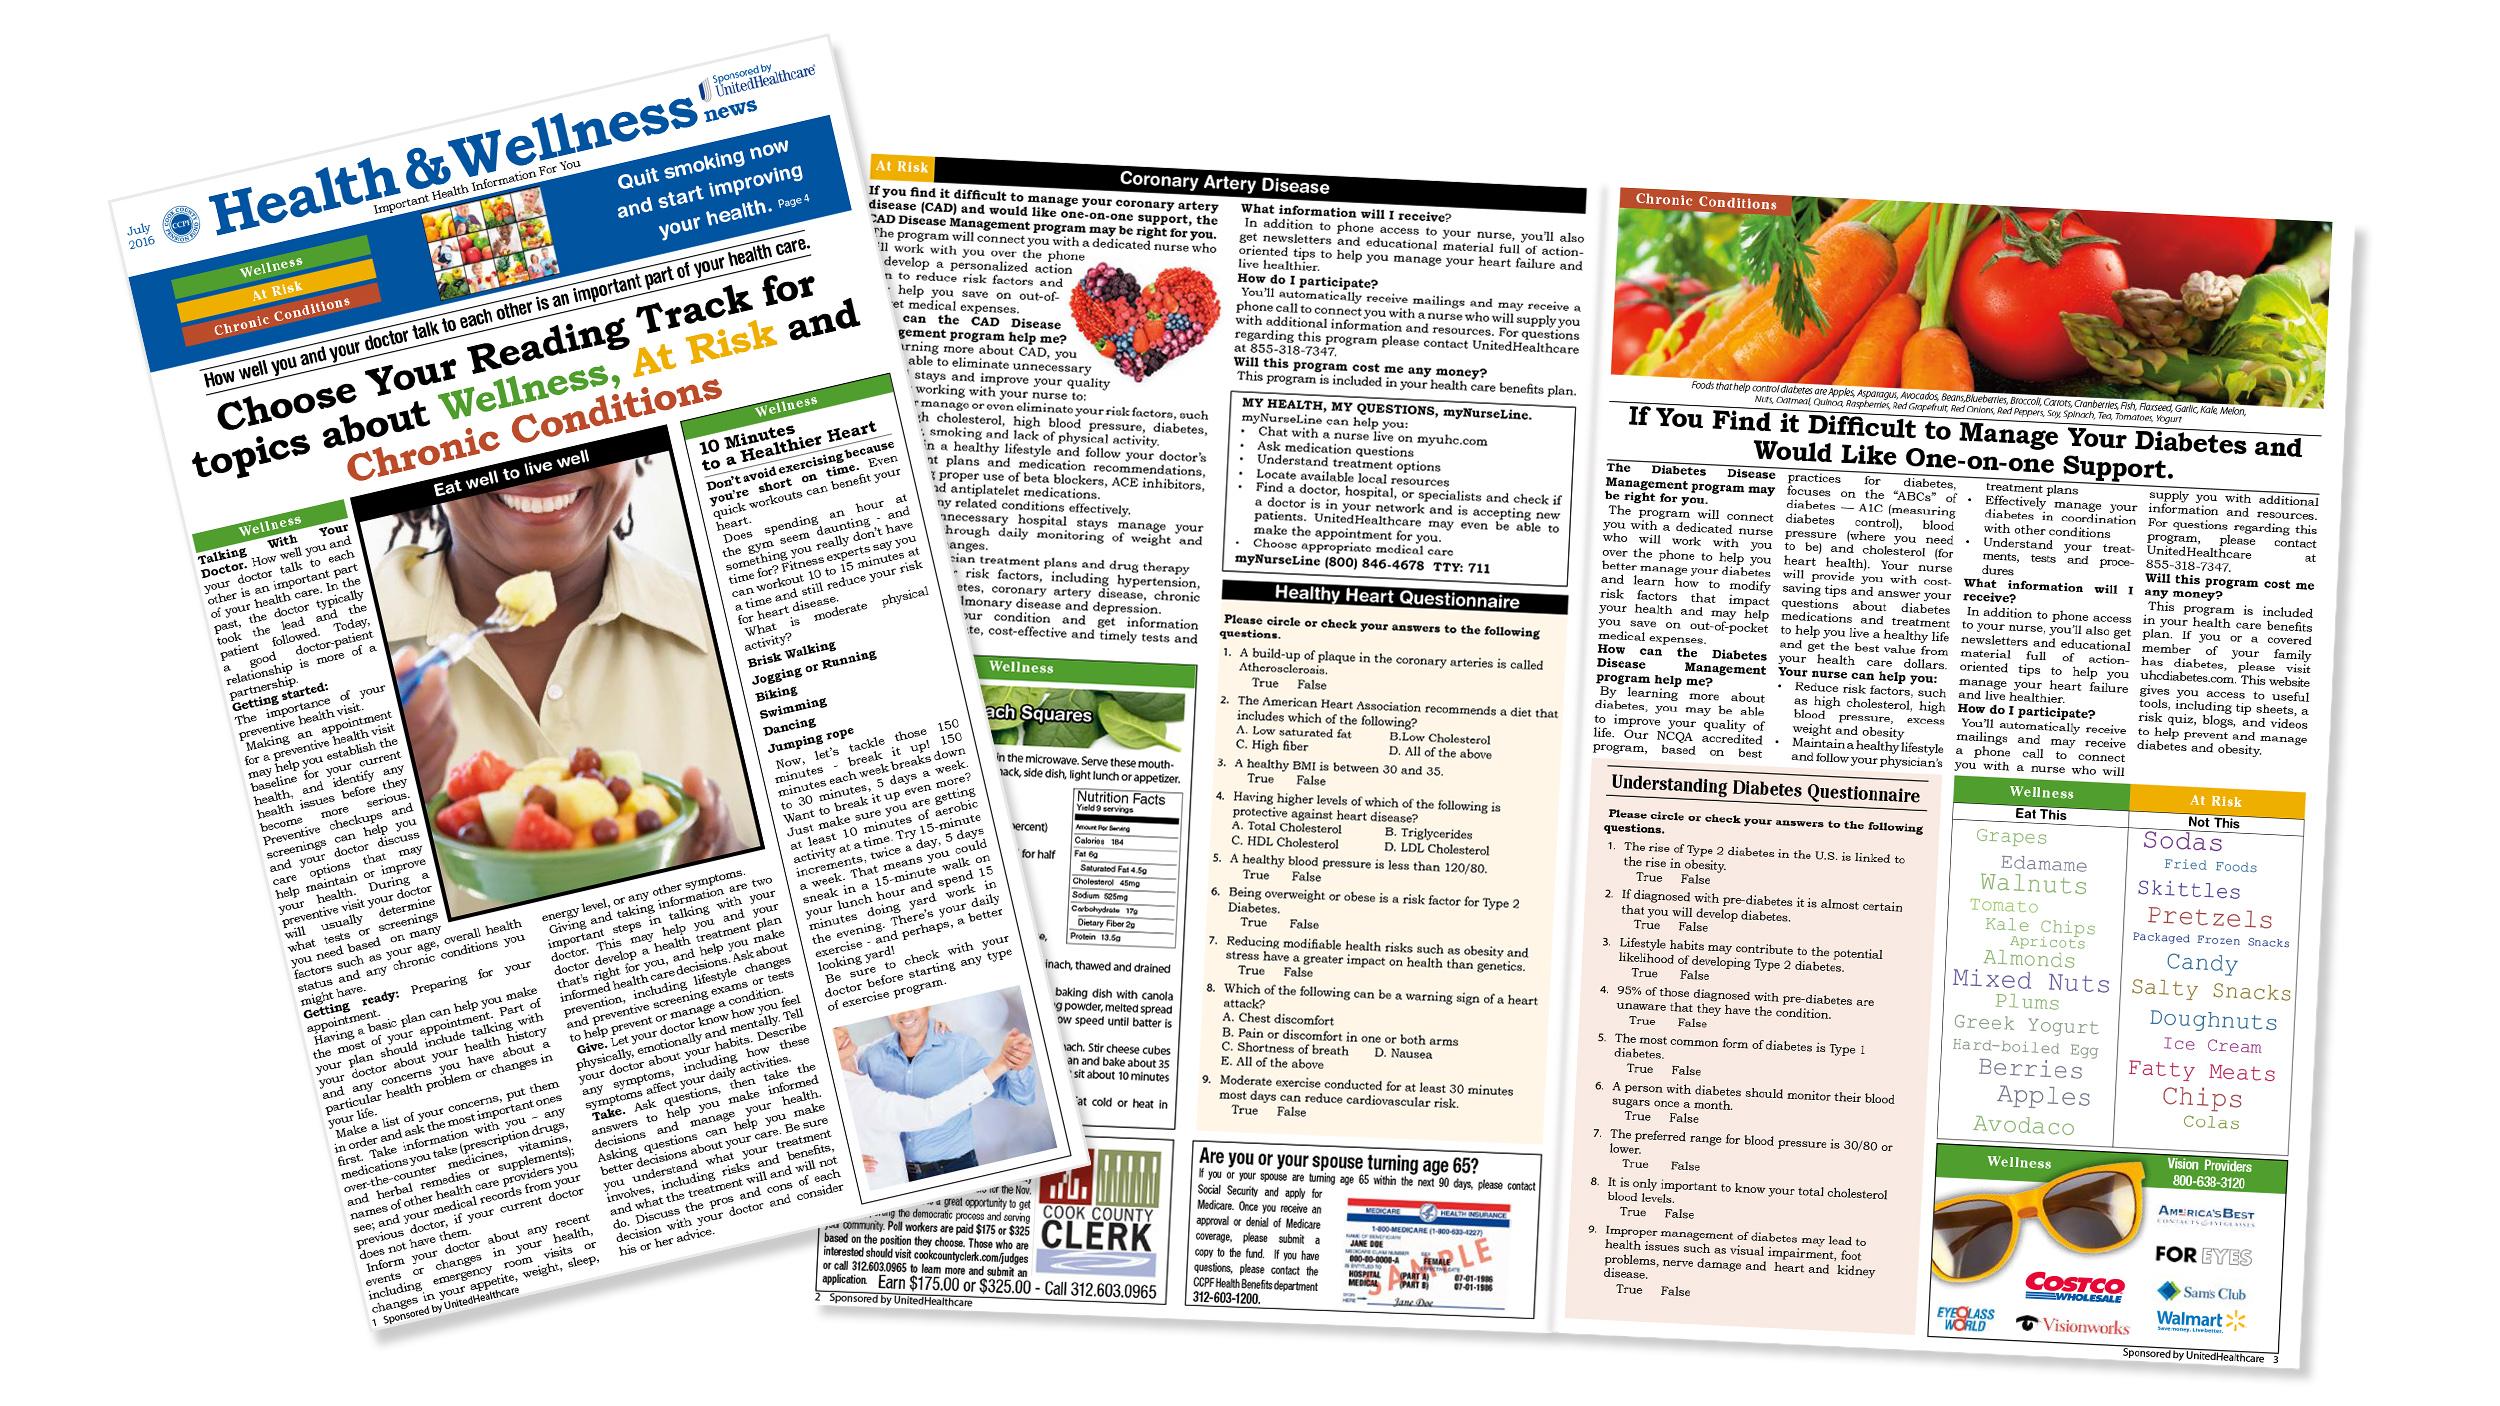 Wellness-newsletter-ccfp-Collateral-Material.jpg